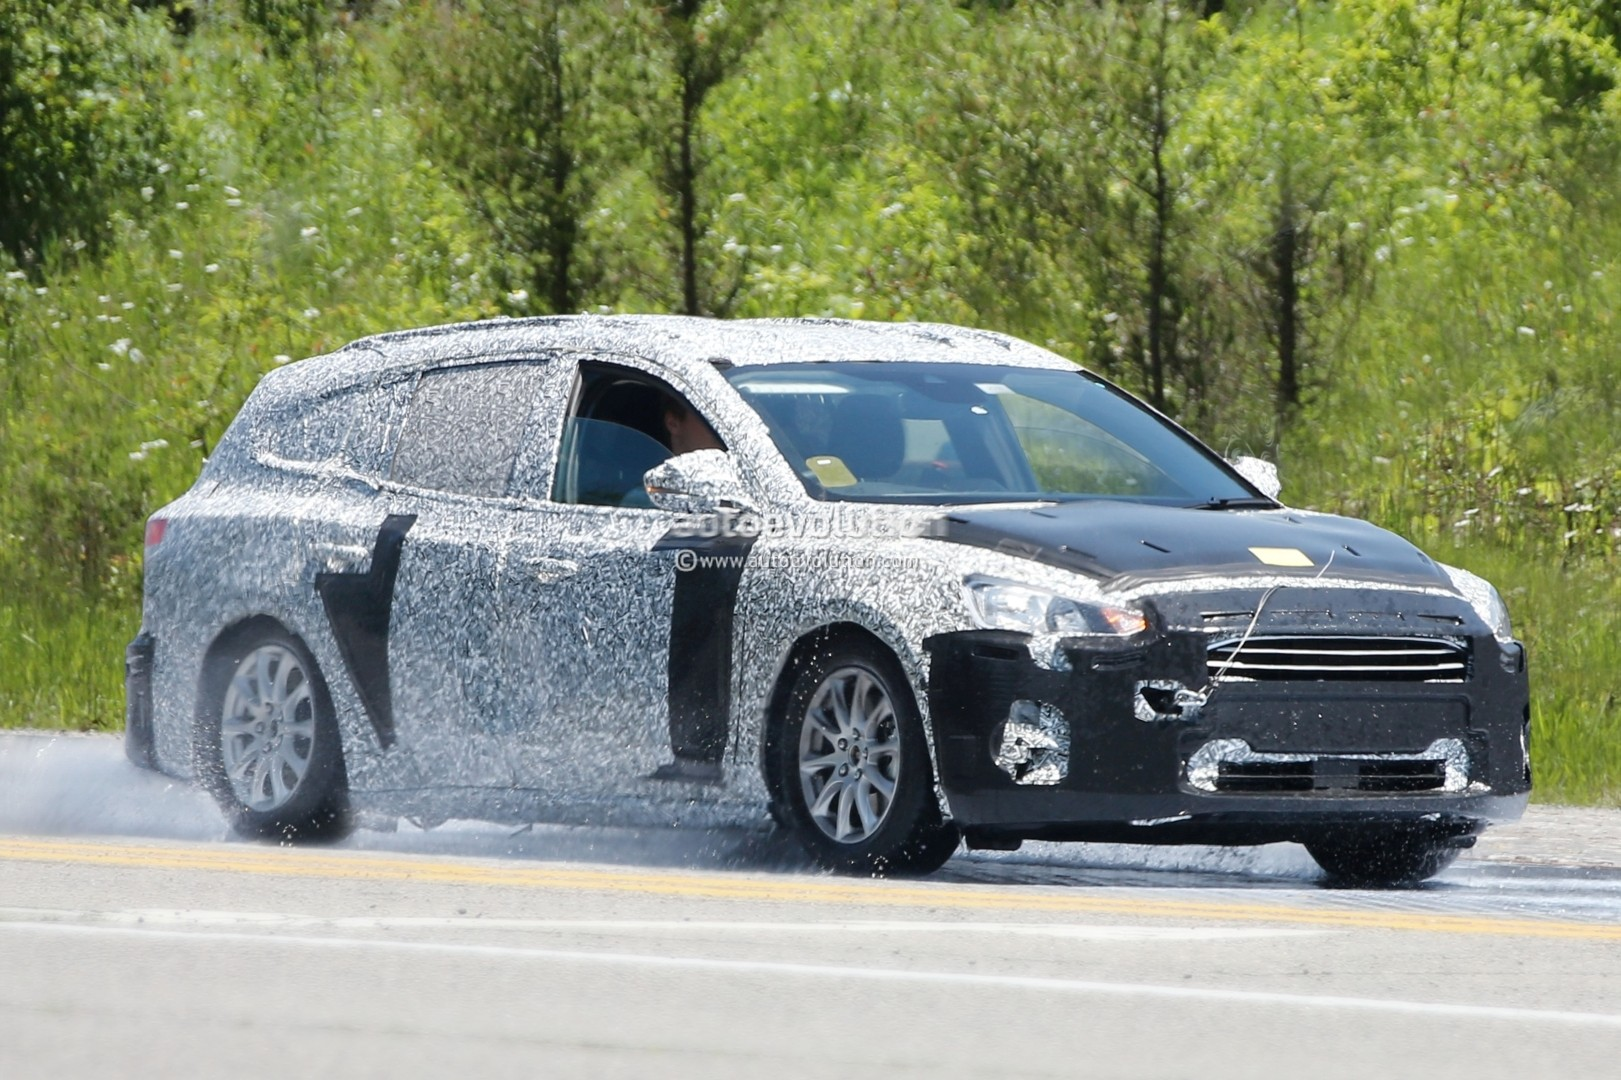 spyshots-2019-ford-focus-wagon-prototype-reveals-longer-rear-doors_1